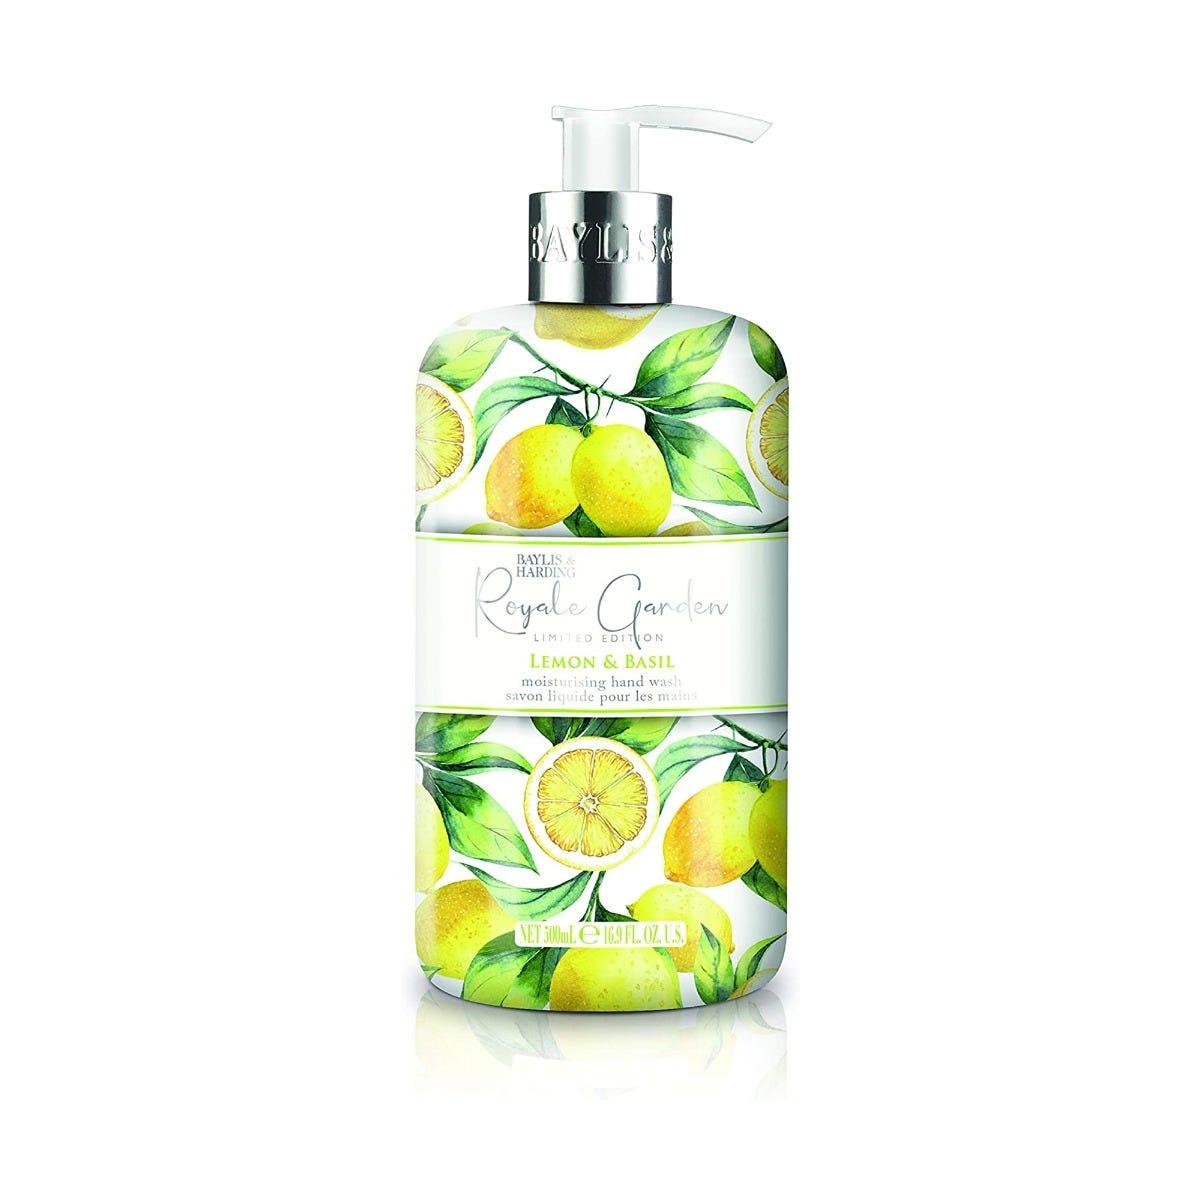 Jabón para manos Baylis & Harding® Royale Garden aroma limón y albahaca